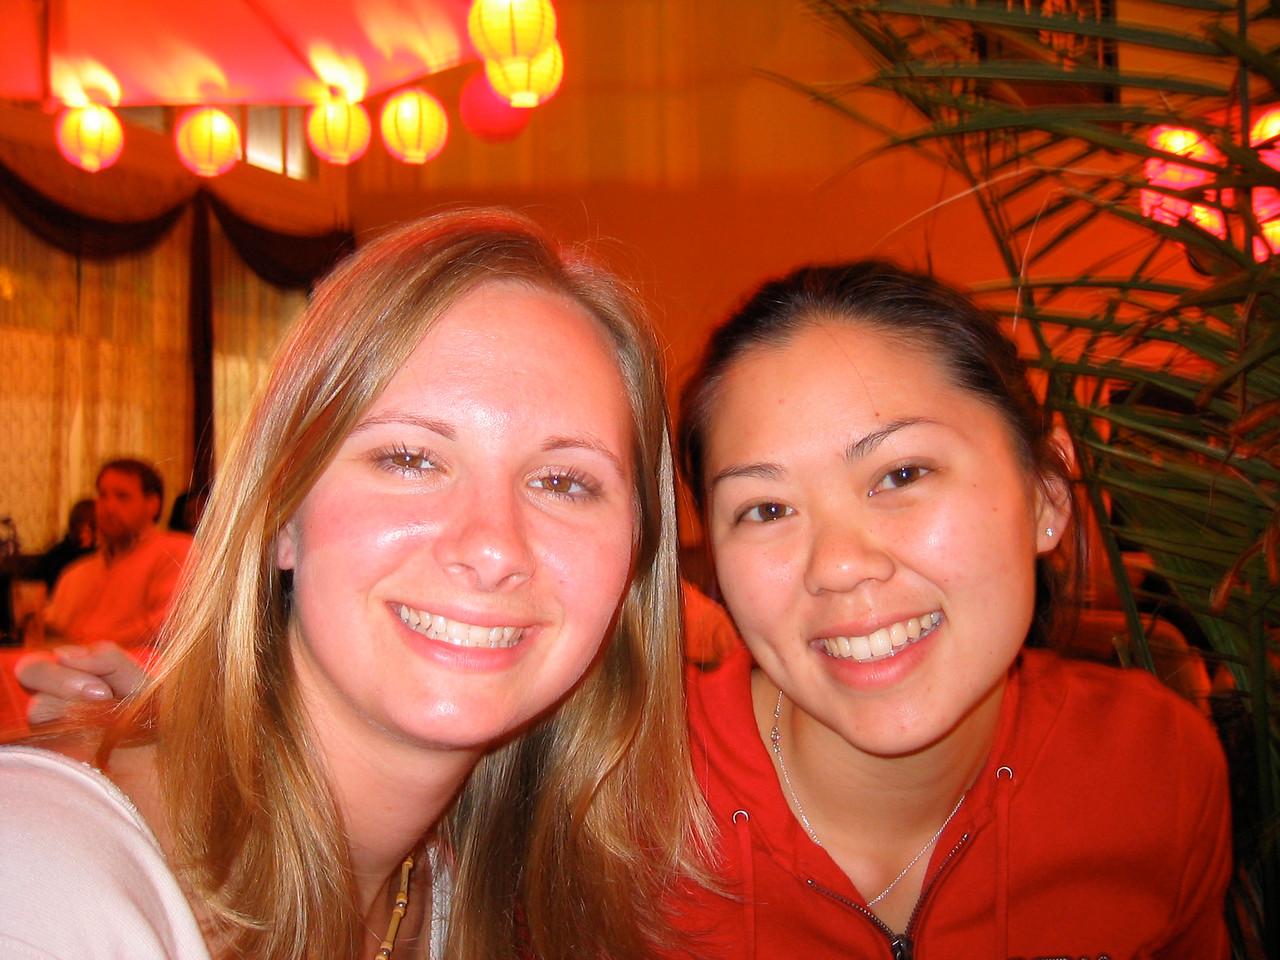 2004 05 15 Saturday - @ Everett & Jones back room jazz - Melody & Tiffany 1